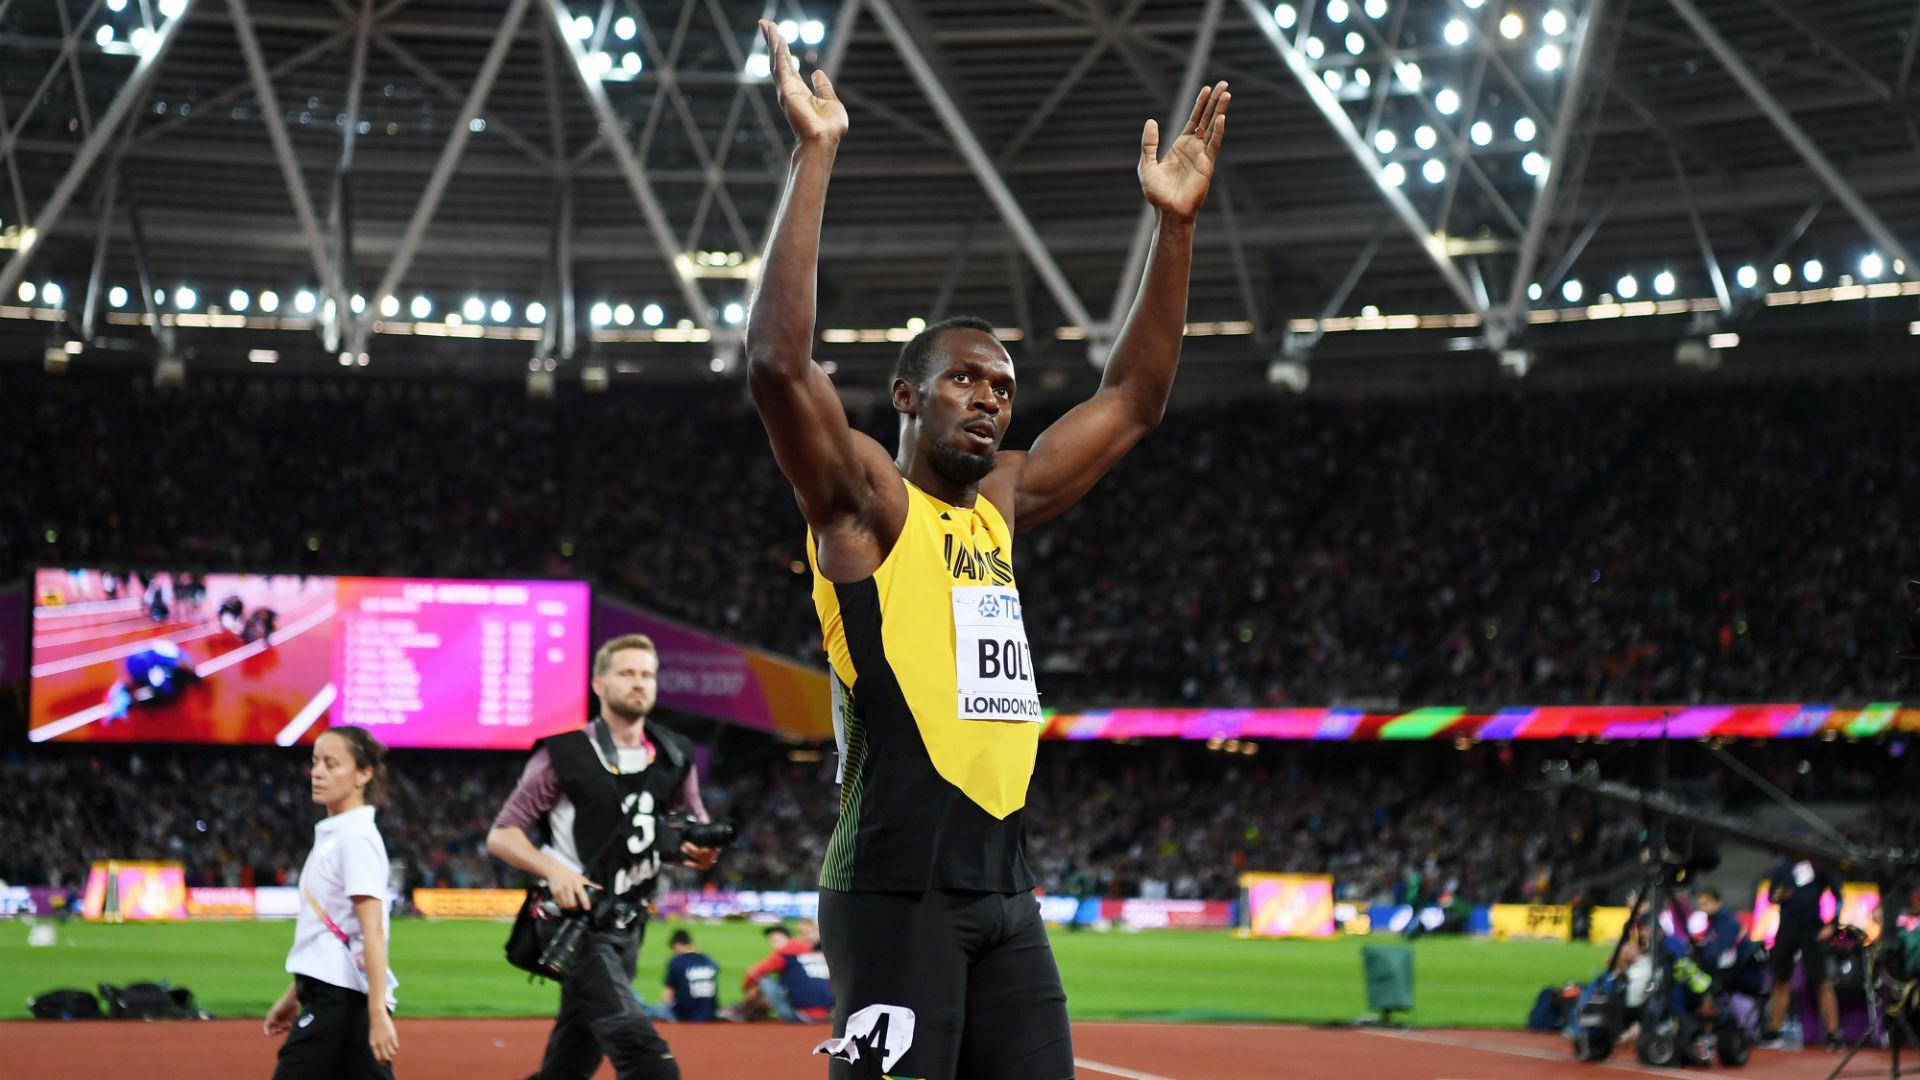 IAAF World Championships 2017 8 Stunning Photos From Usain Bolts Final 100 Meter Race